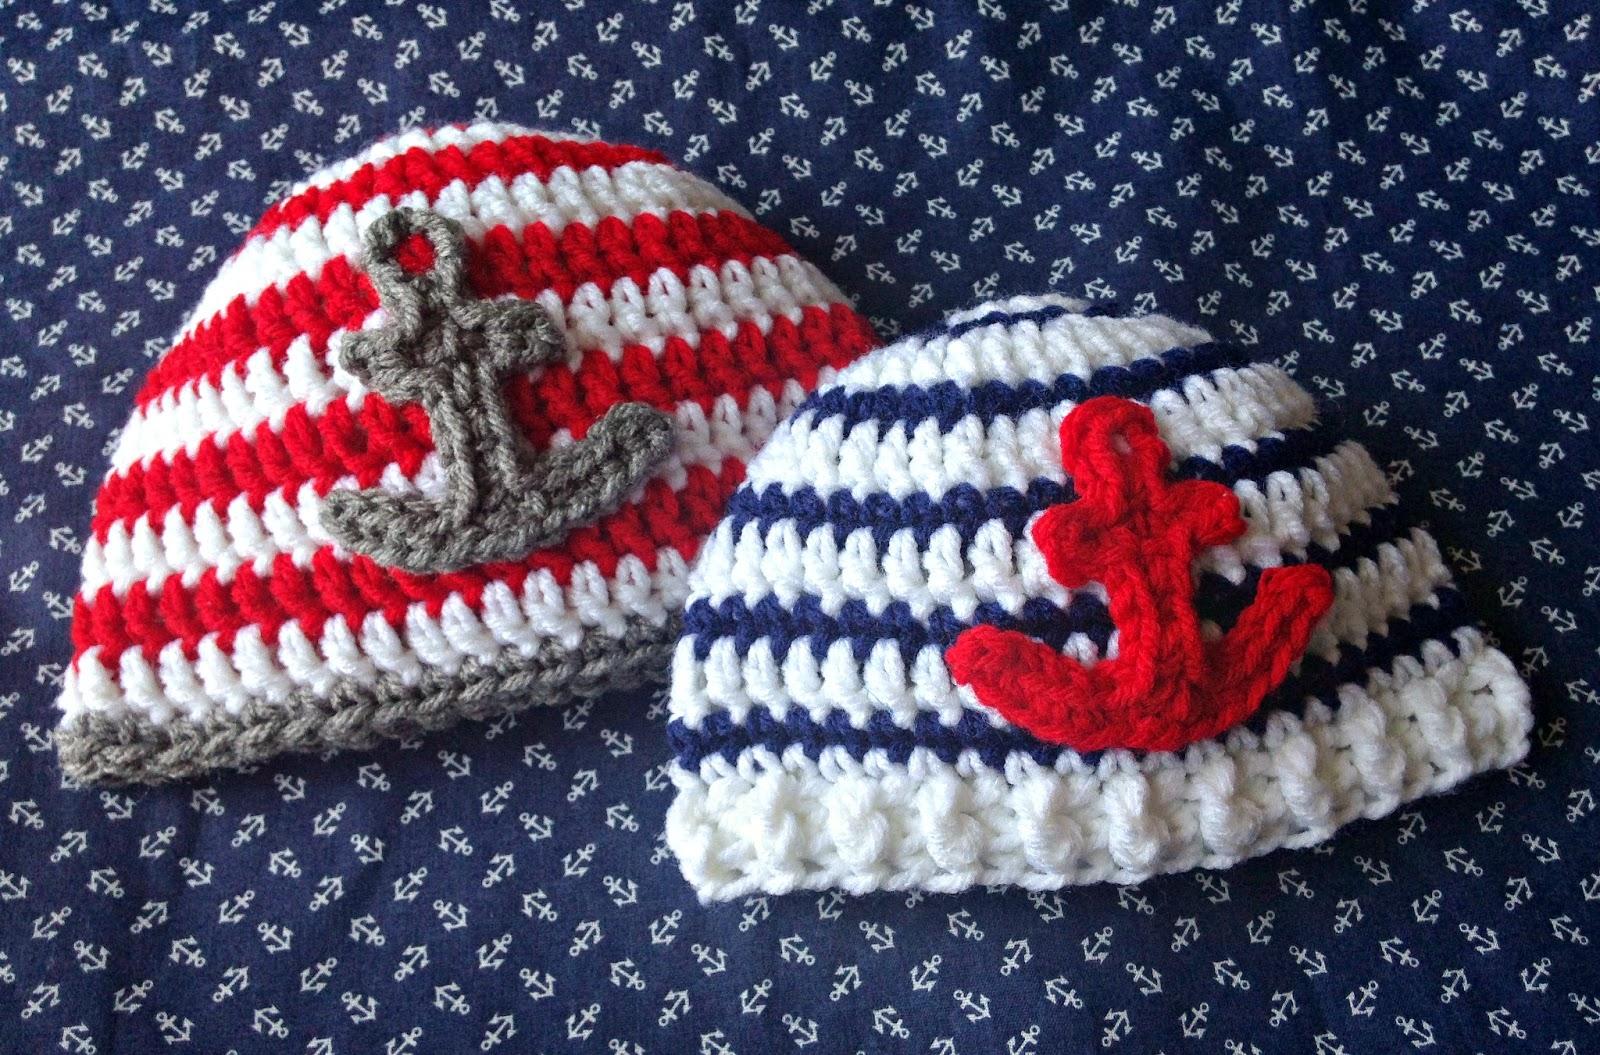 5 little monsters free crochet pattern anchor baby hats free crochet pattern anchor baby hats bankloansurffo Gallery